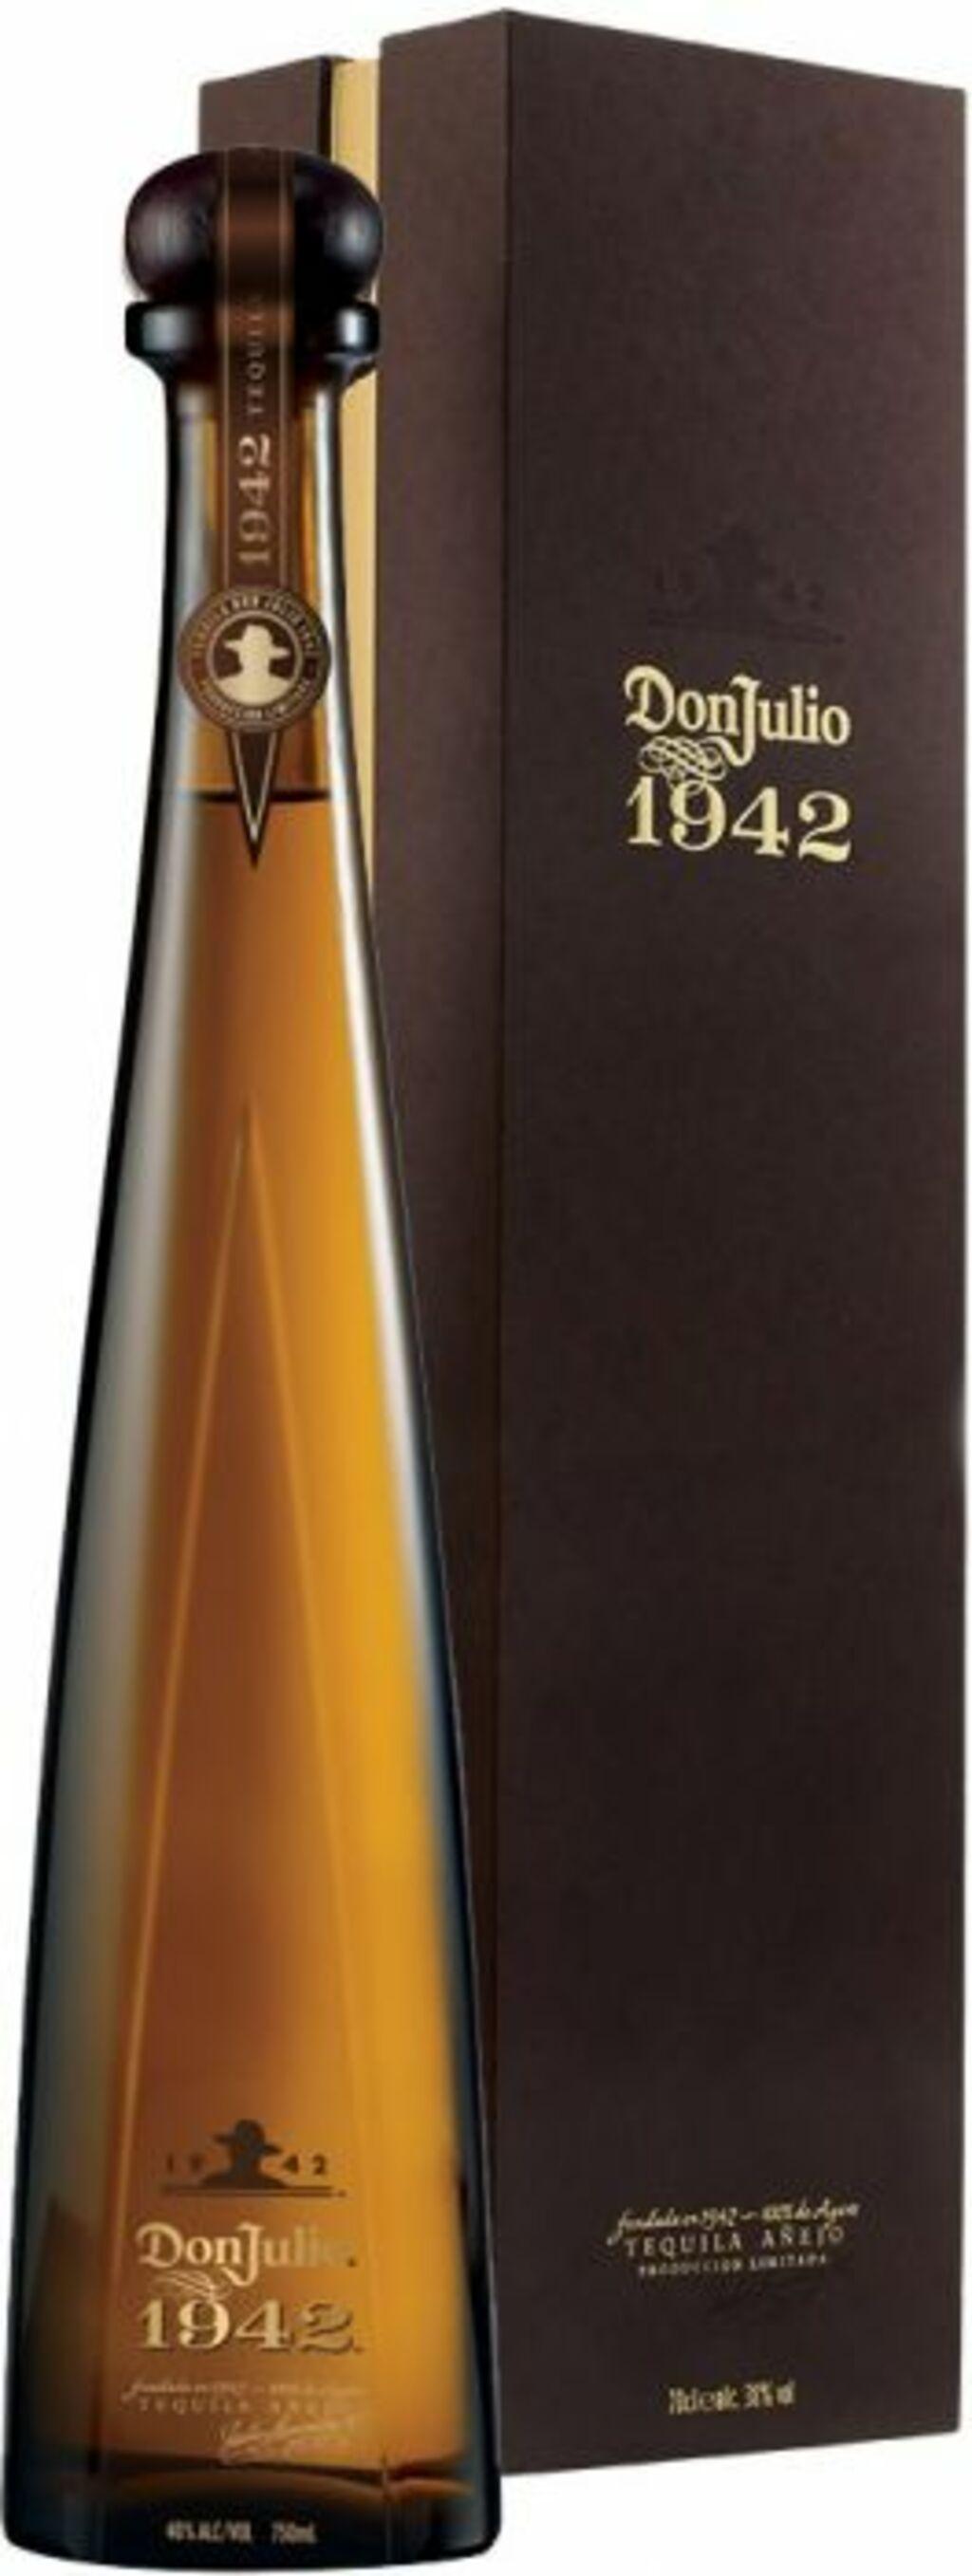 DON JULIO TEQUILA ANEJO 1942 750ML via Remedy Liquor